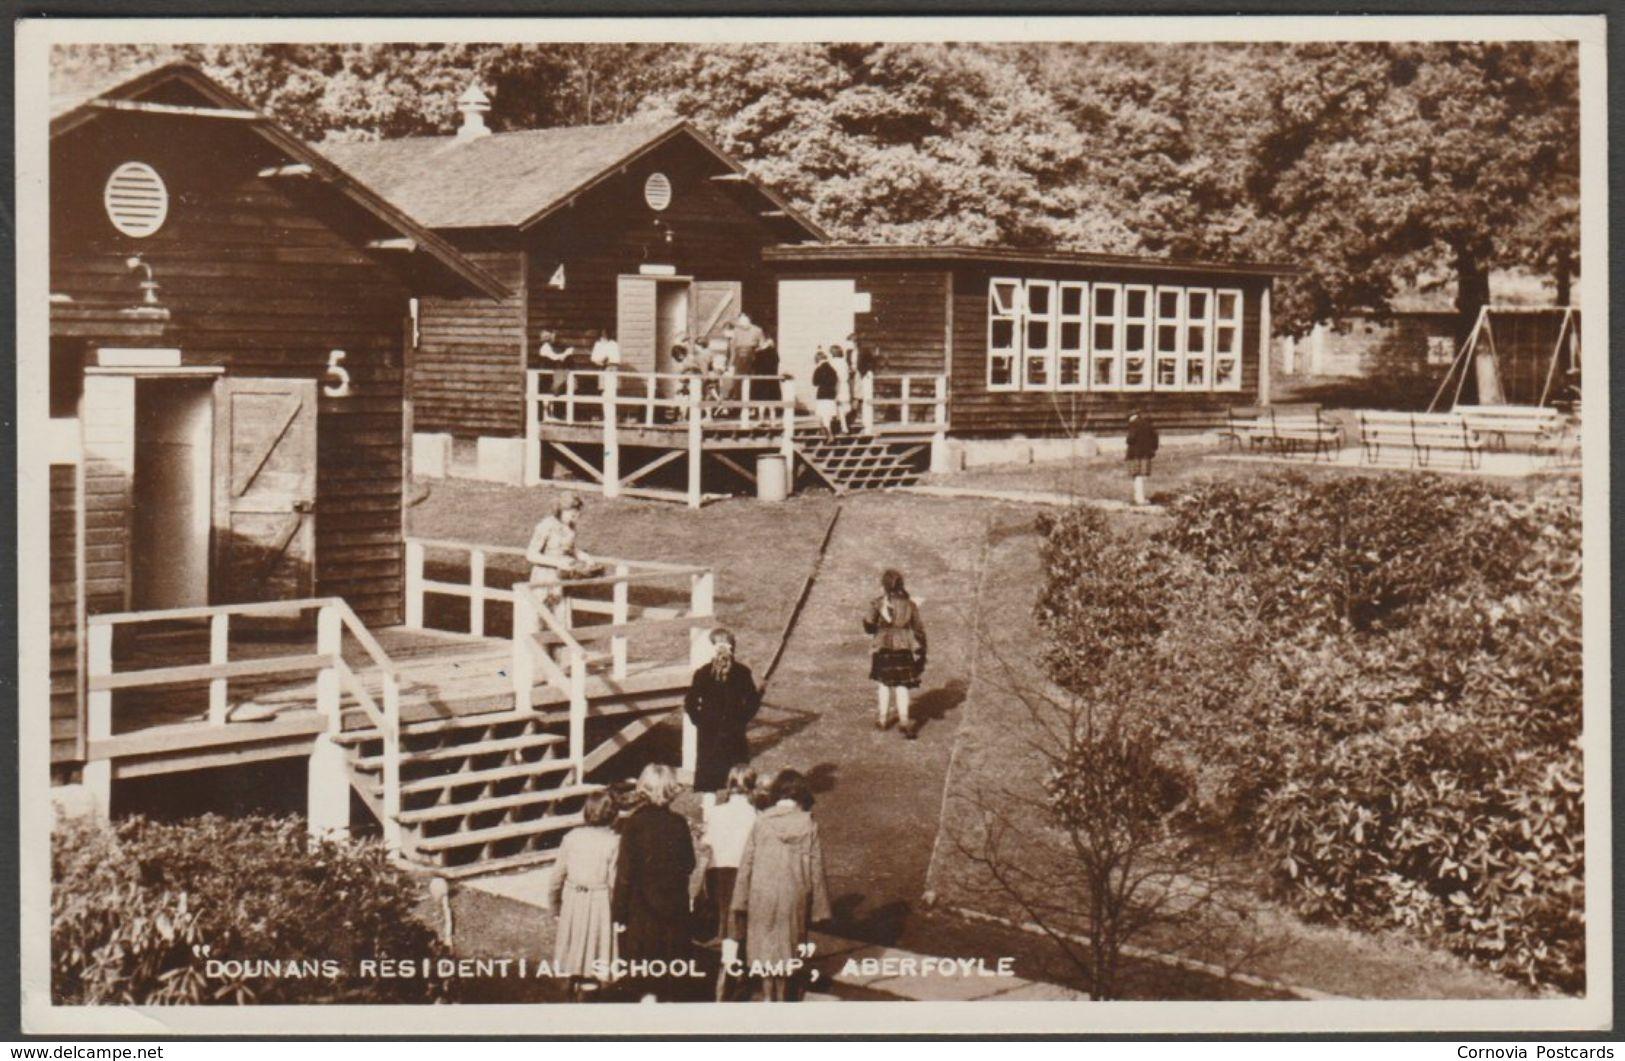 Dounans Residential School Camp, Aberfoyle, Perthshire, 1960 - Valentine's RP Postcard - Perthshire